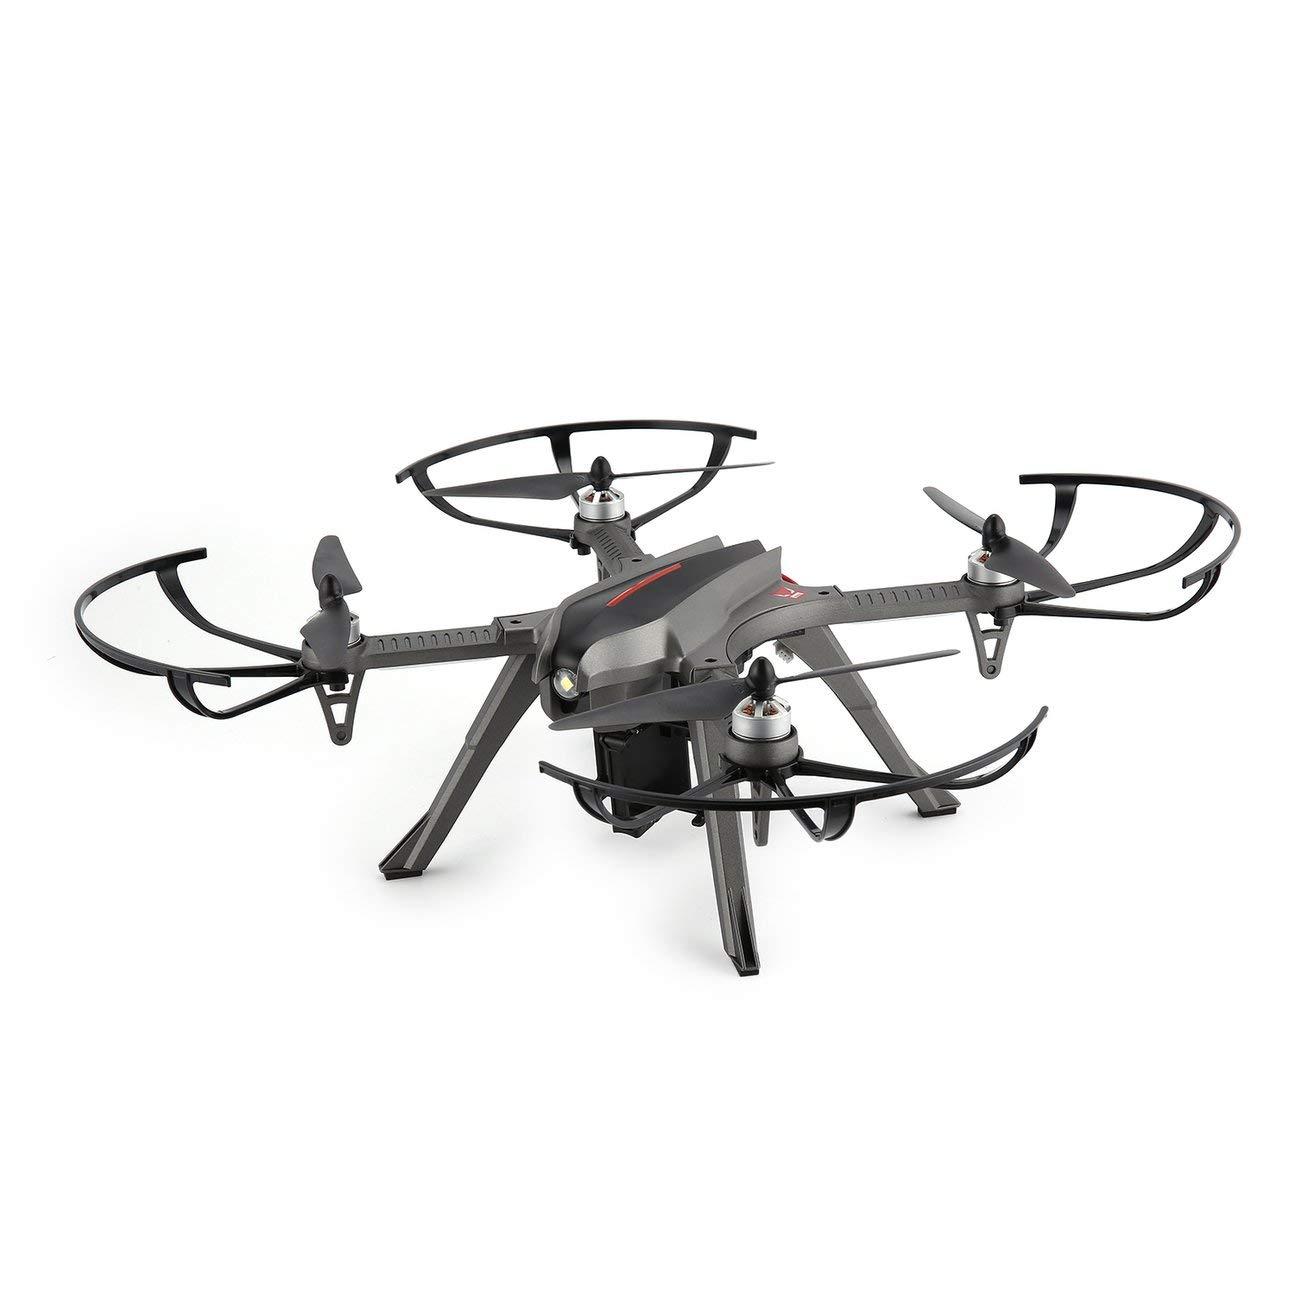 MJX Bugs B3H RC Drohne Quadcopter Quadcopter Drohne Frei zum Schalten der Höhe Halten RC Quadcopter Drohne Brushless Motor 1806 1800KV Keine Kamera Silber & Grau 207ef2